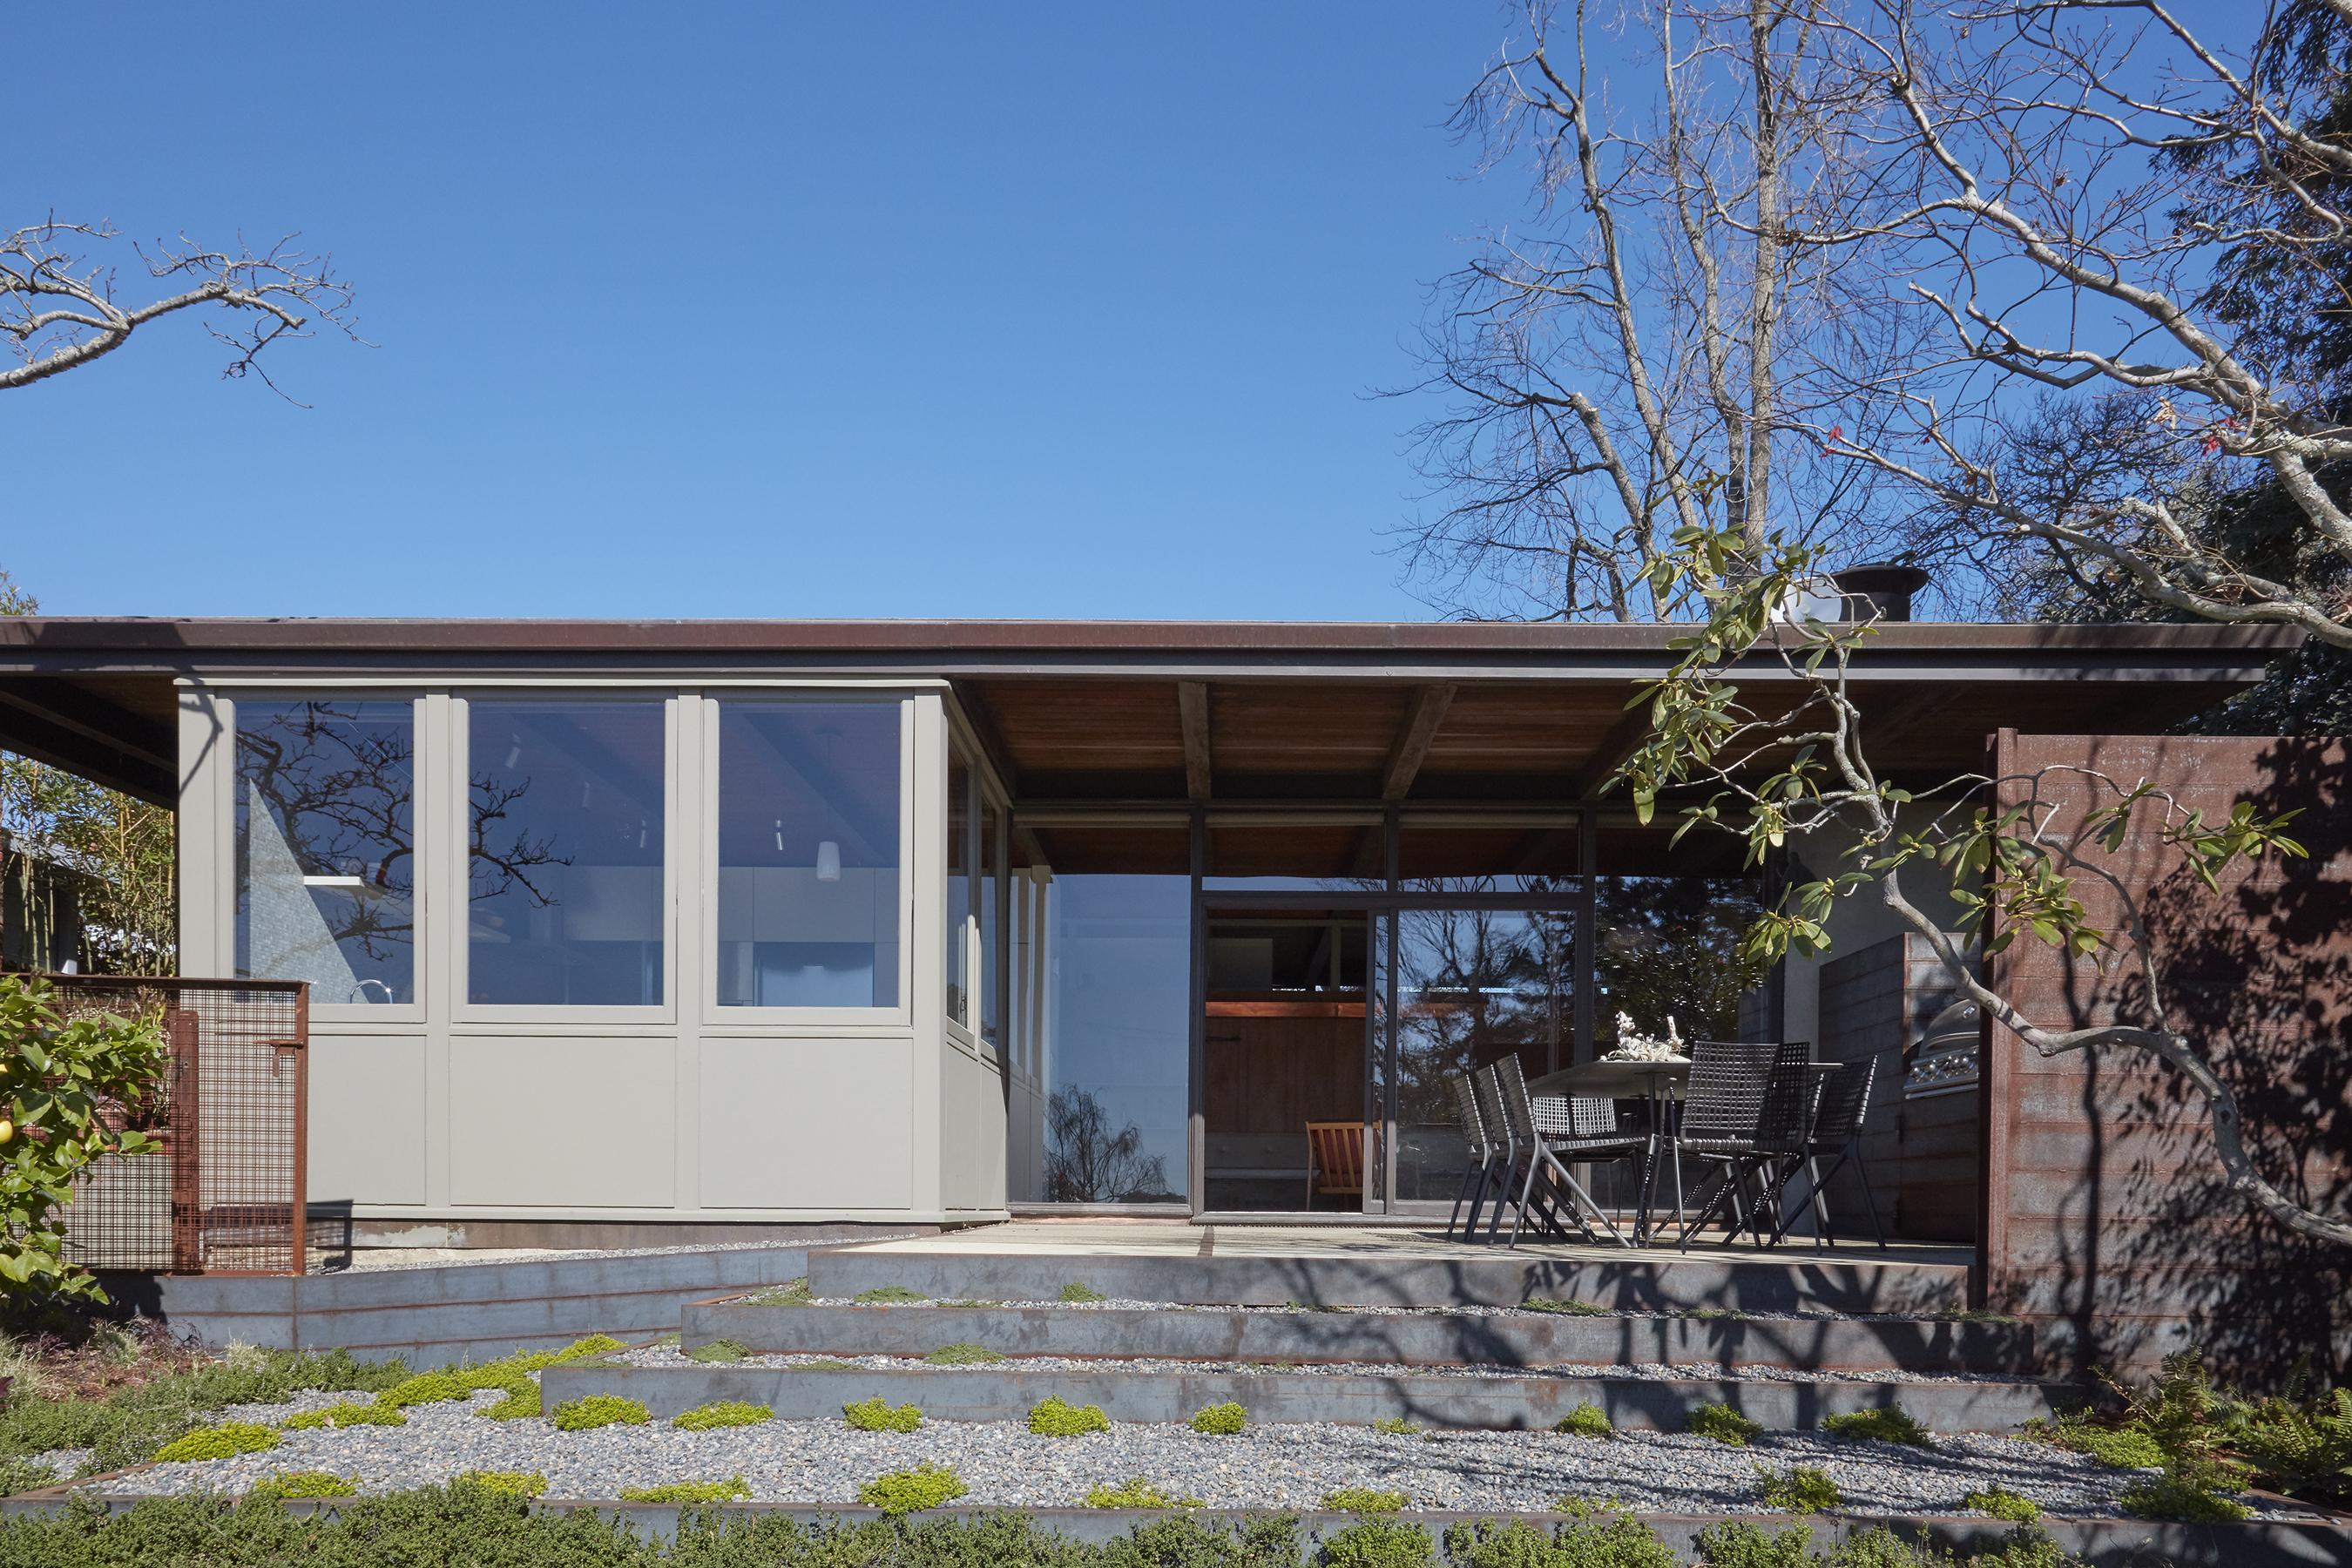 Berkeley Ridge midcentury modern home outside view facing the house